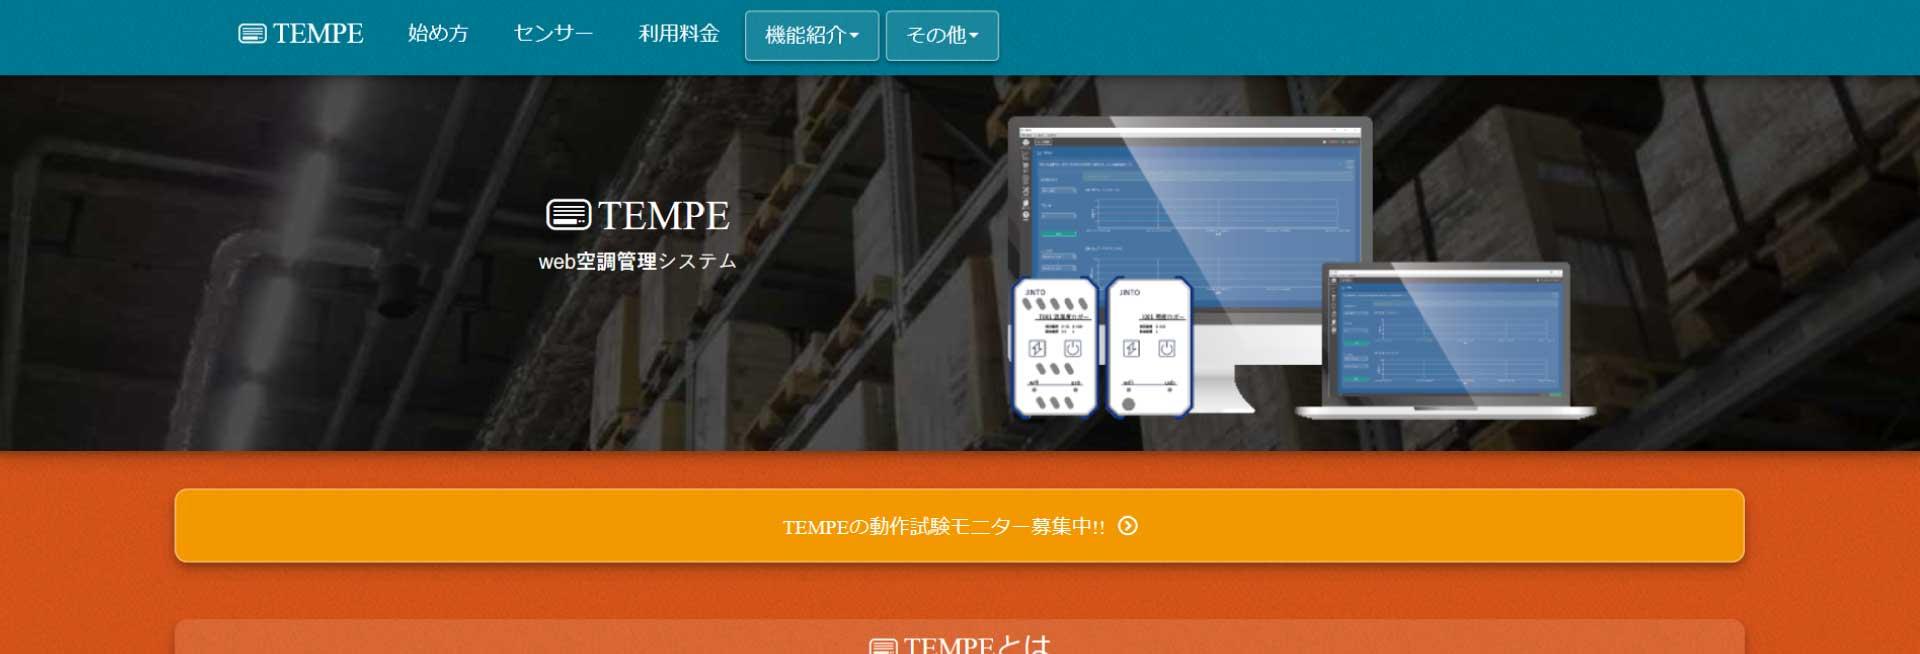 TEMPE(web空調管理システム)